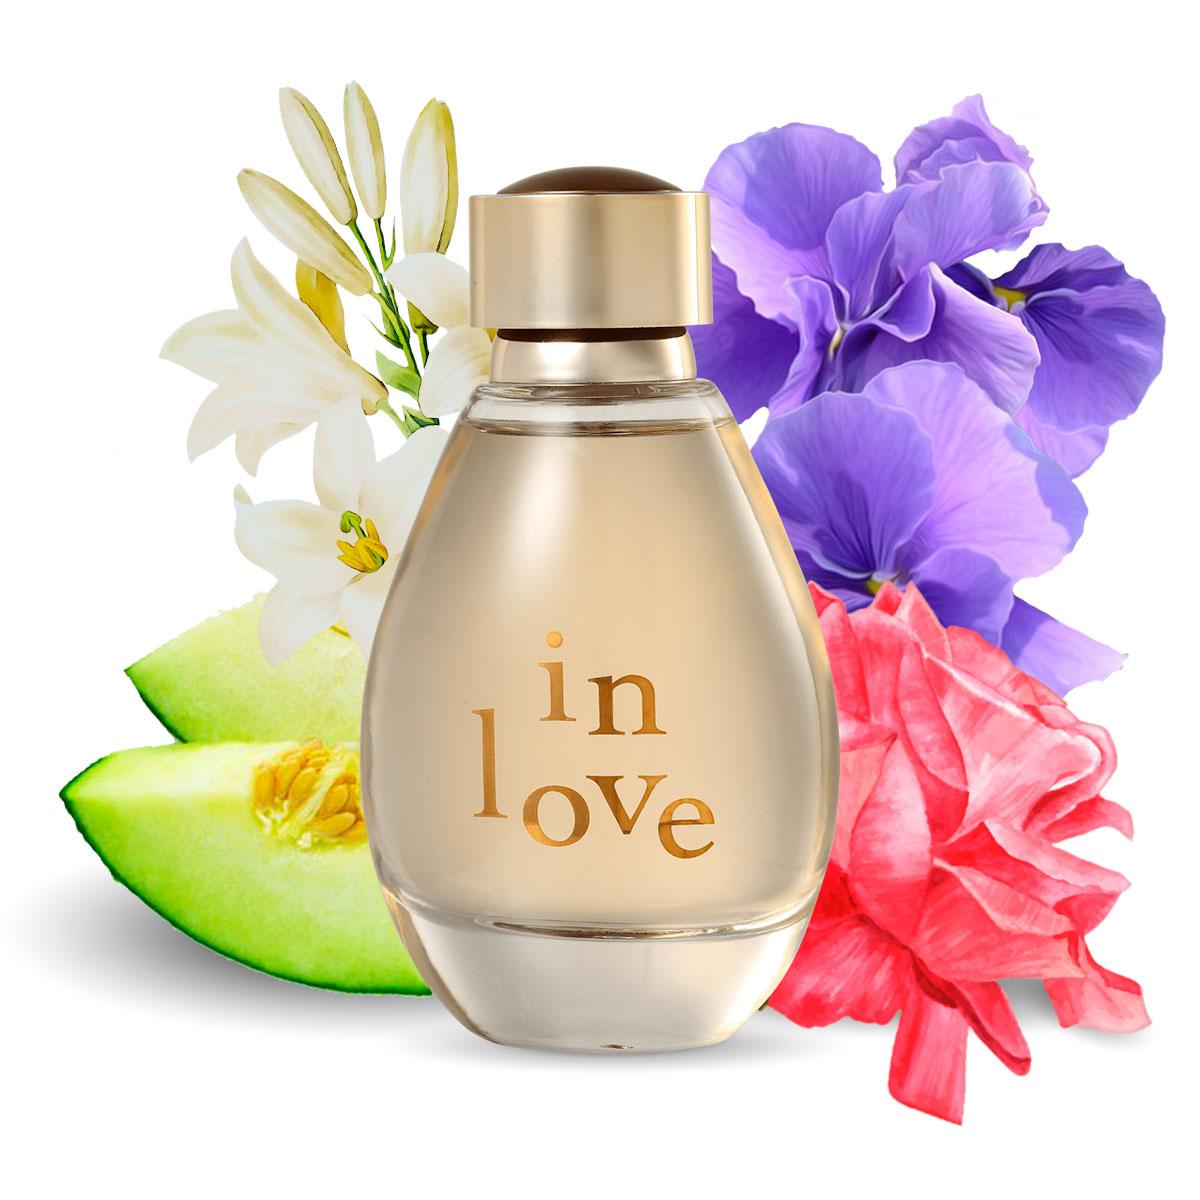 Kit 3 Perfumes Importados Femininos In Love La Rive